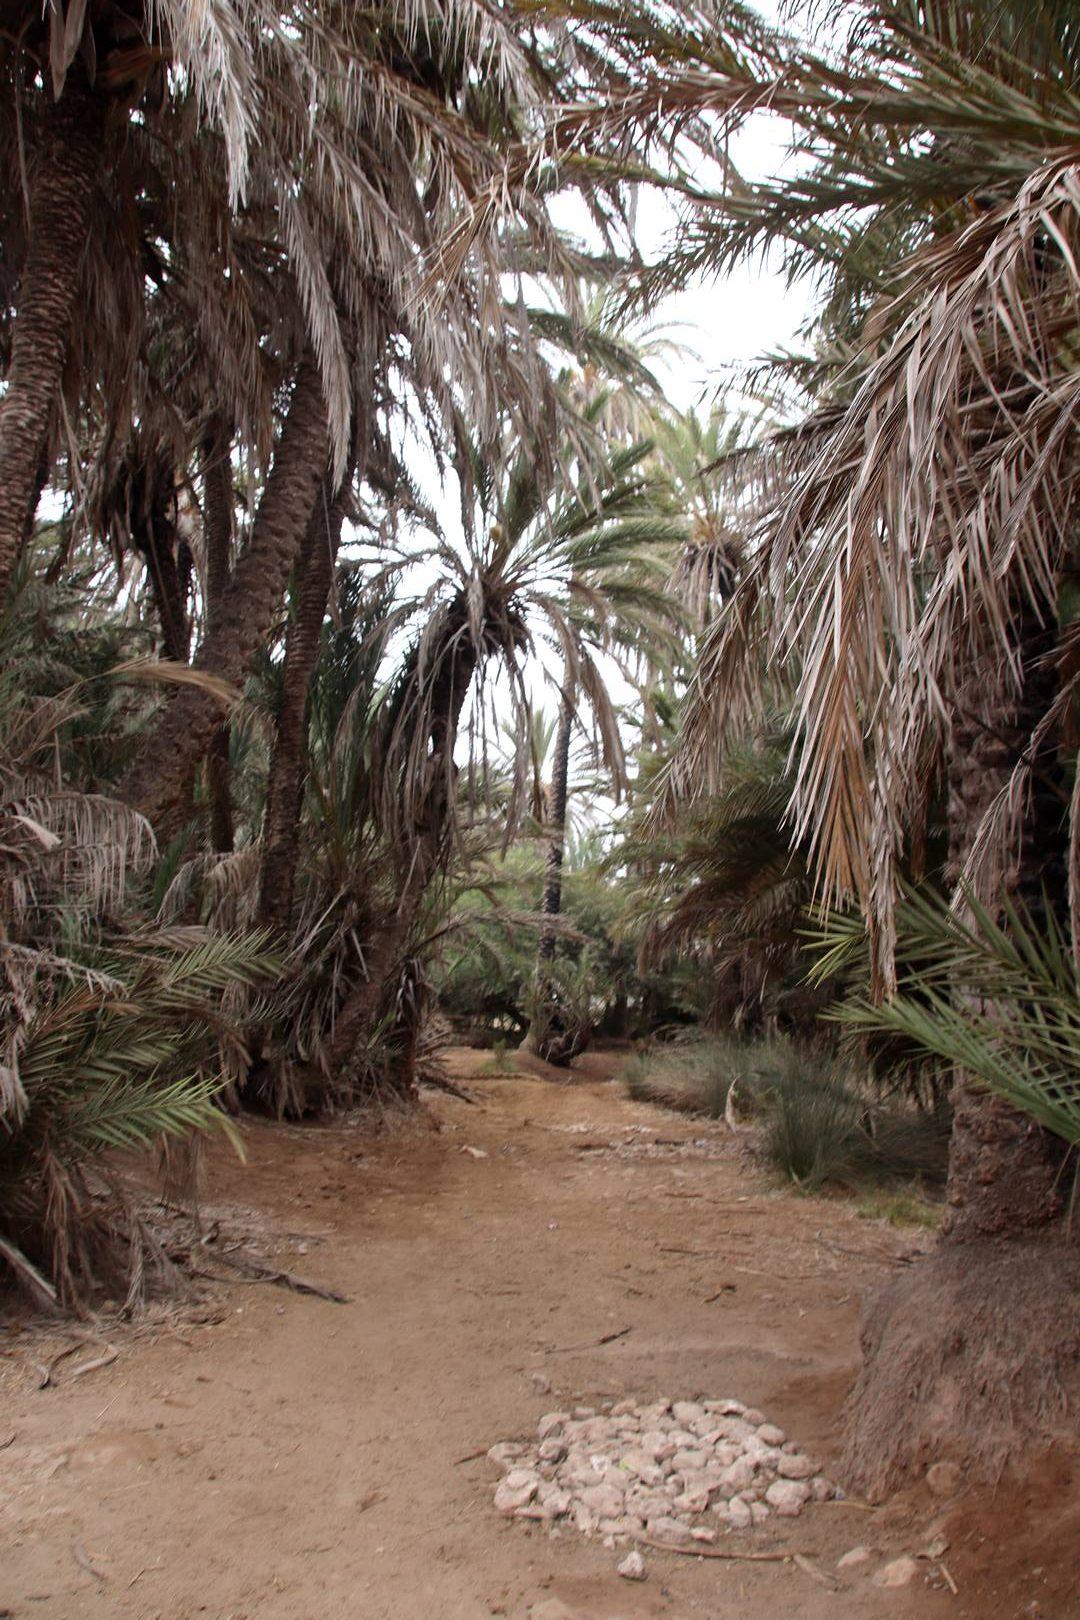 Maroc - Palmeraie de l'oasis Ain Lahdjar à côté d'Essaouira